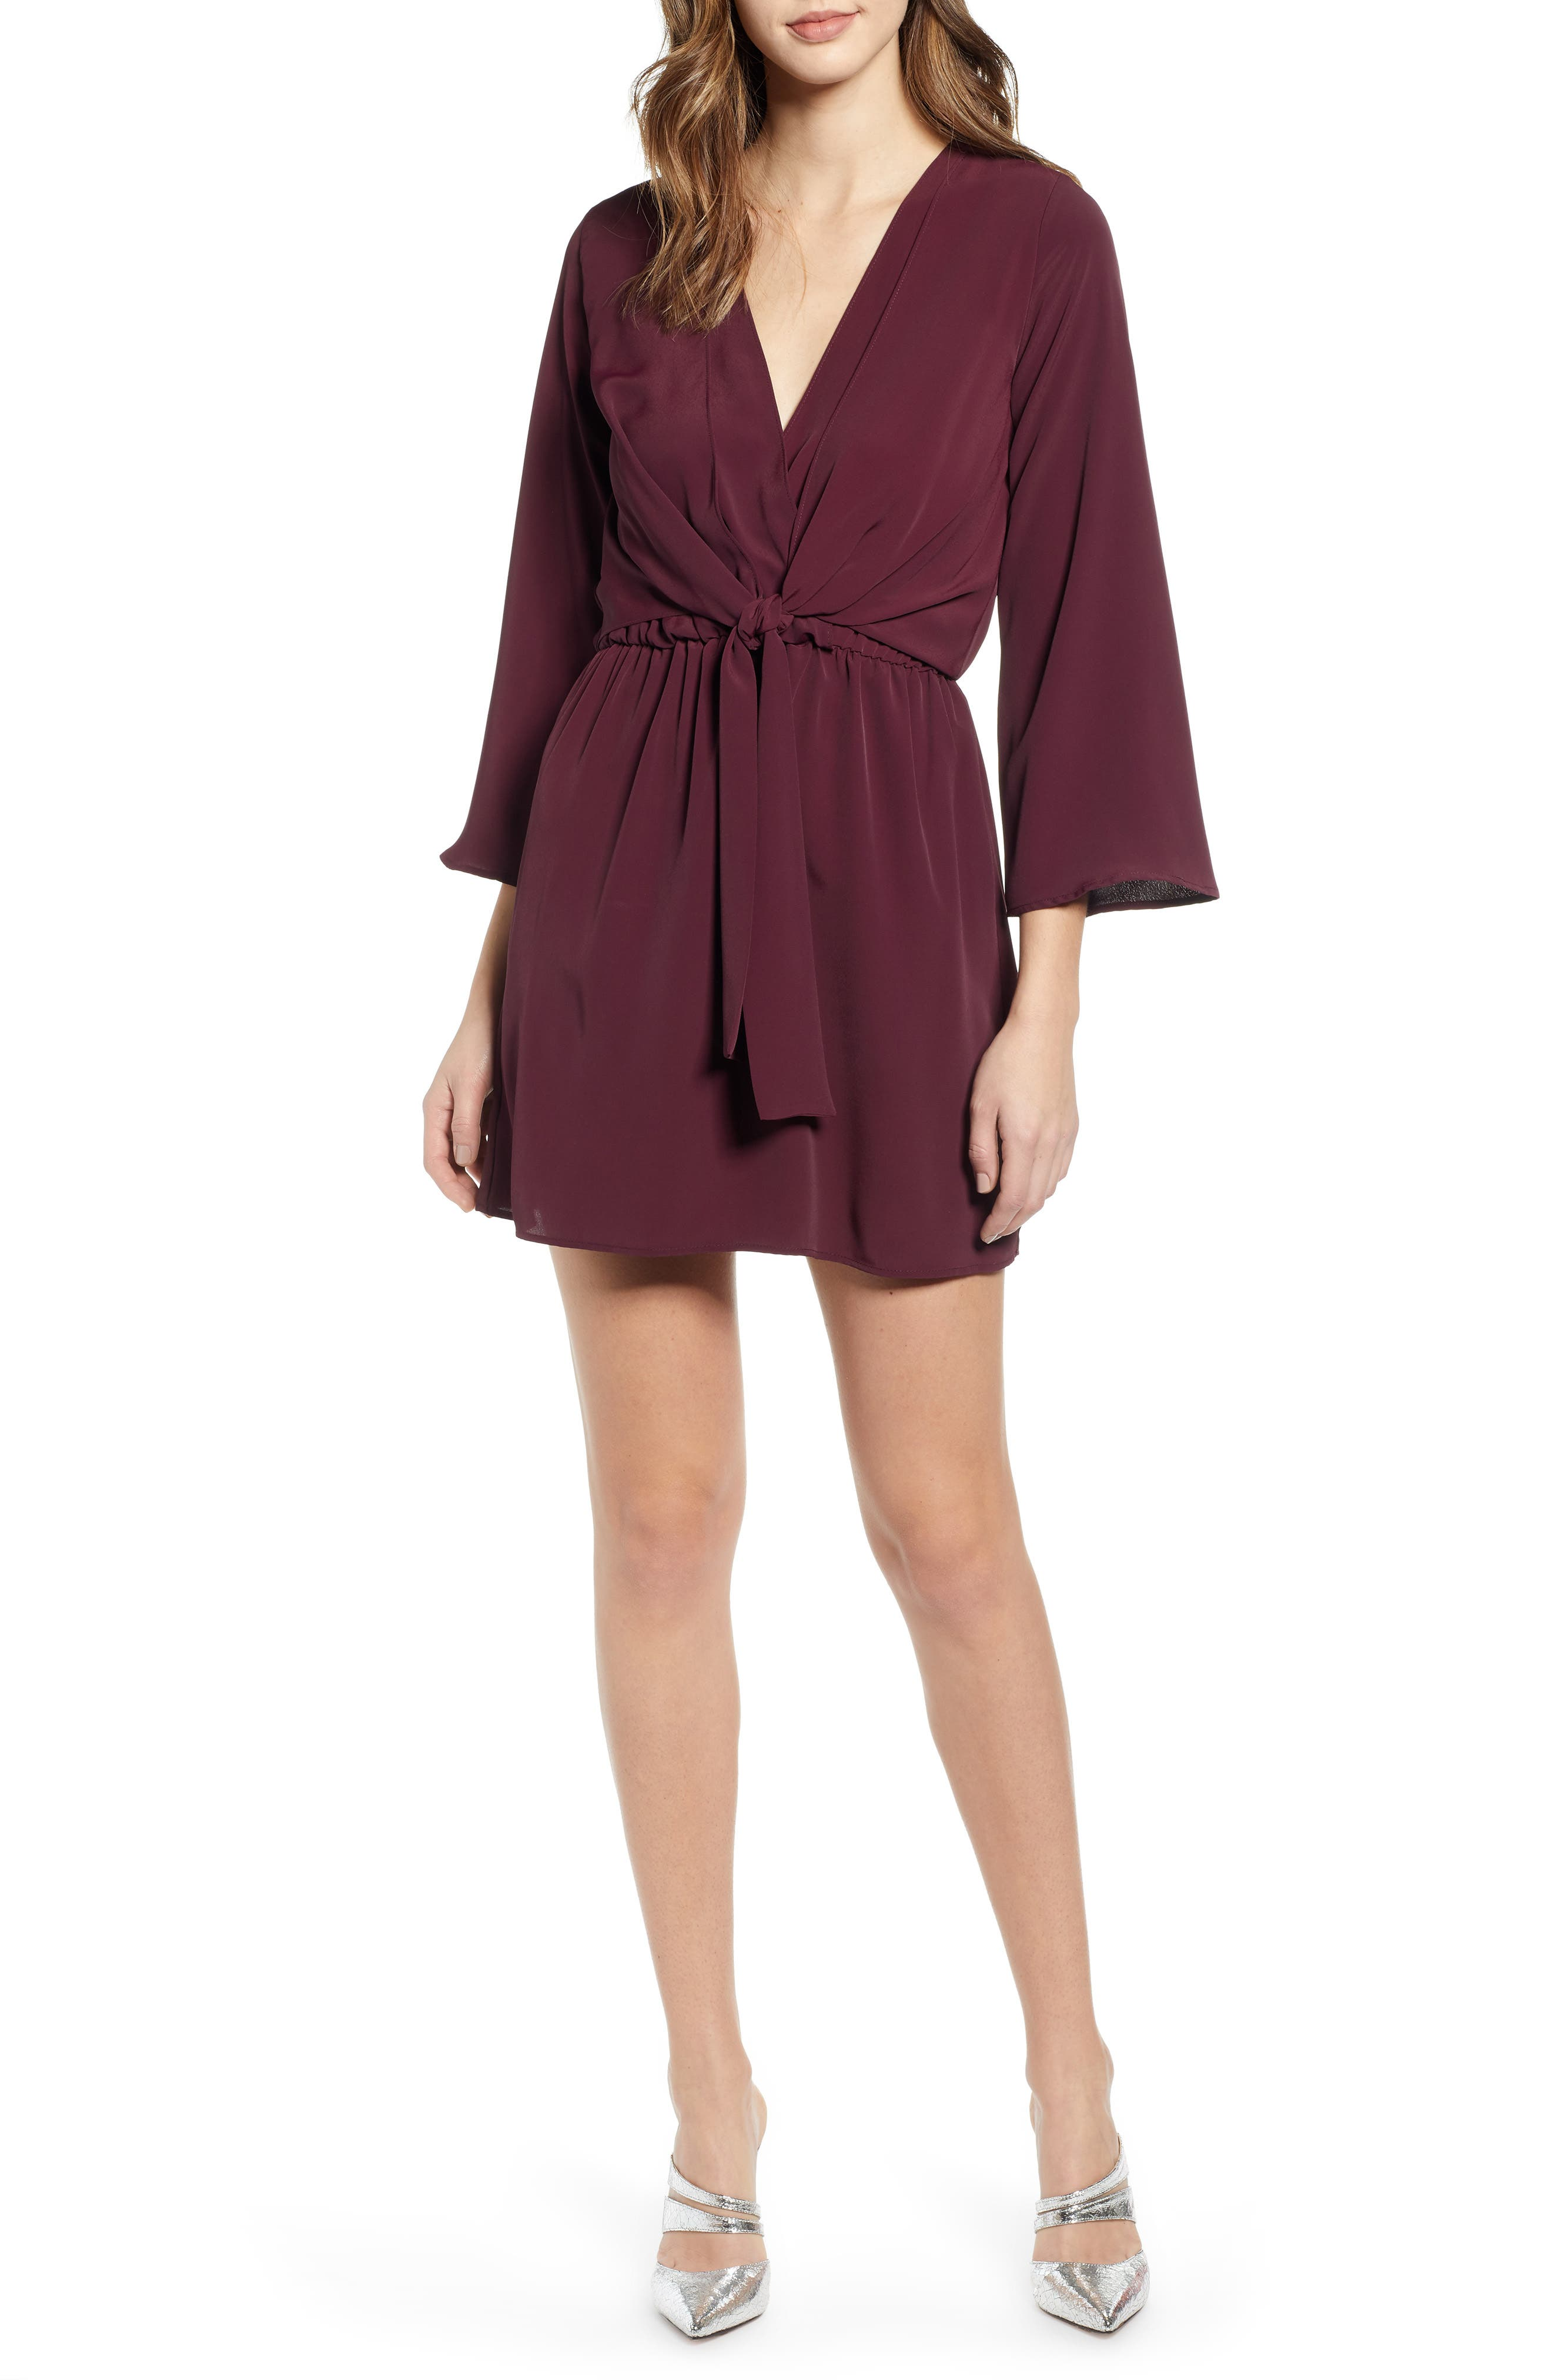 Topshop Tiffany Knot Minidress, US (fits like 10-12) - Burgundy